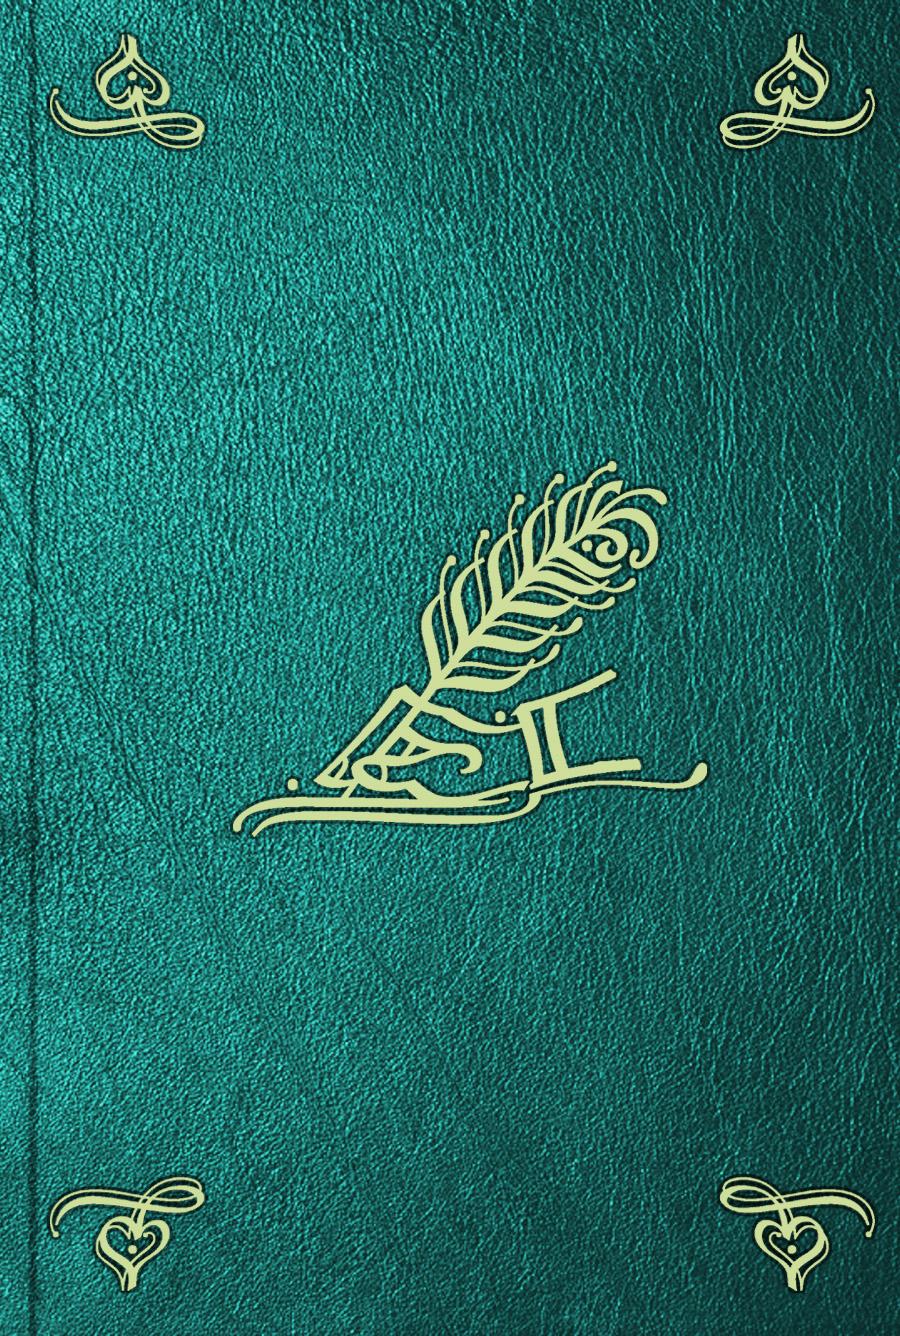 Отсутствует Journal historique du voyage de l'ambassadeur de Perse en France moritz von kotzebue voyage en perse a la suite de l ambassade russe en 1817